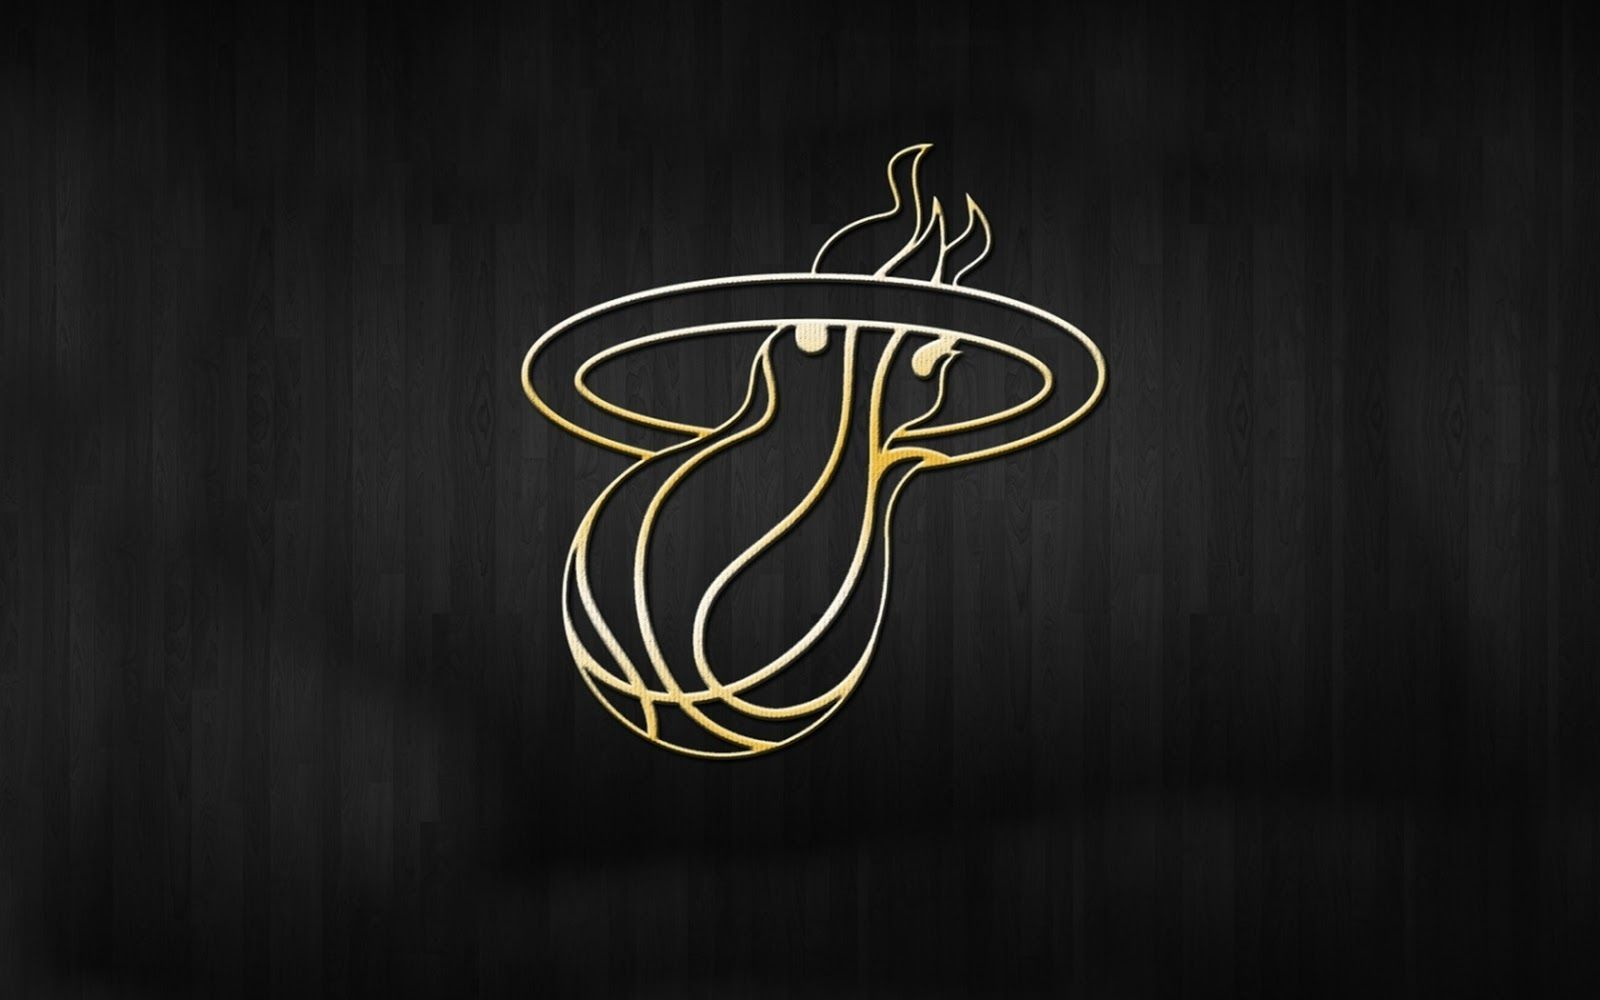 Miami Heat Wallpaper Pc Laptop Miami Heat Pictures In Fhd Miami Heat Logo Miami Heat Basketball Wallpapers Hd